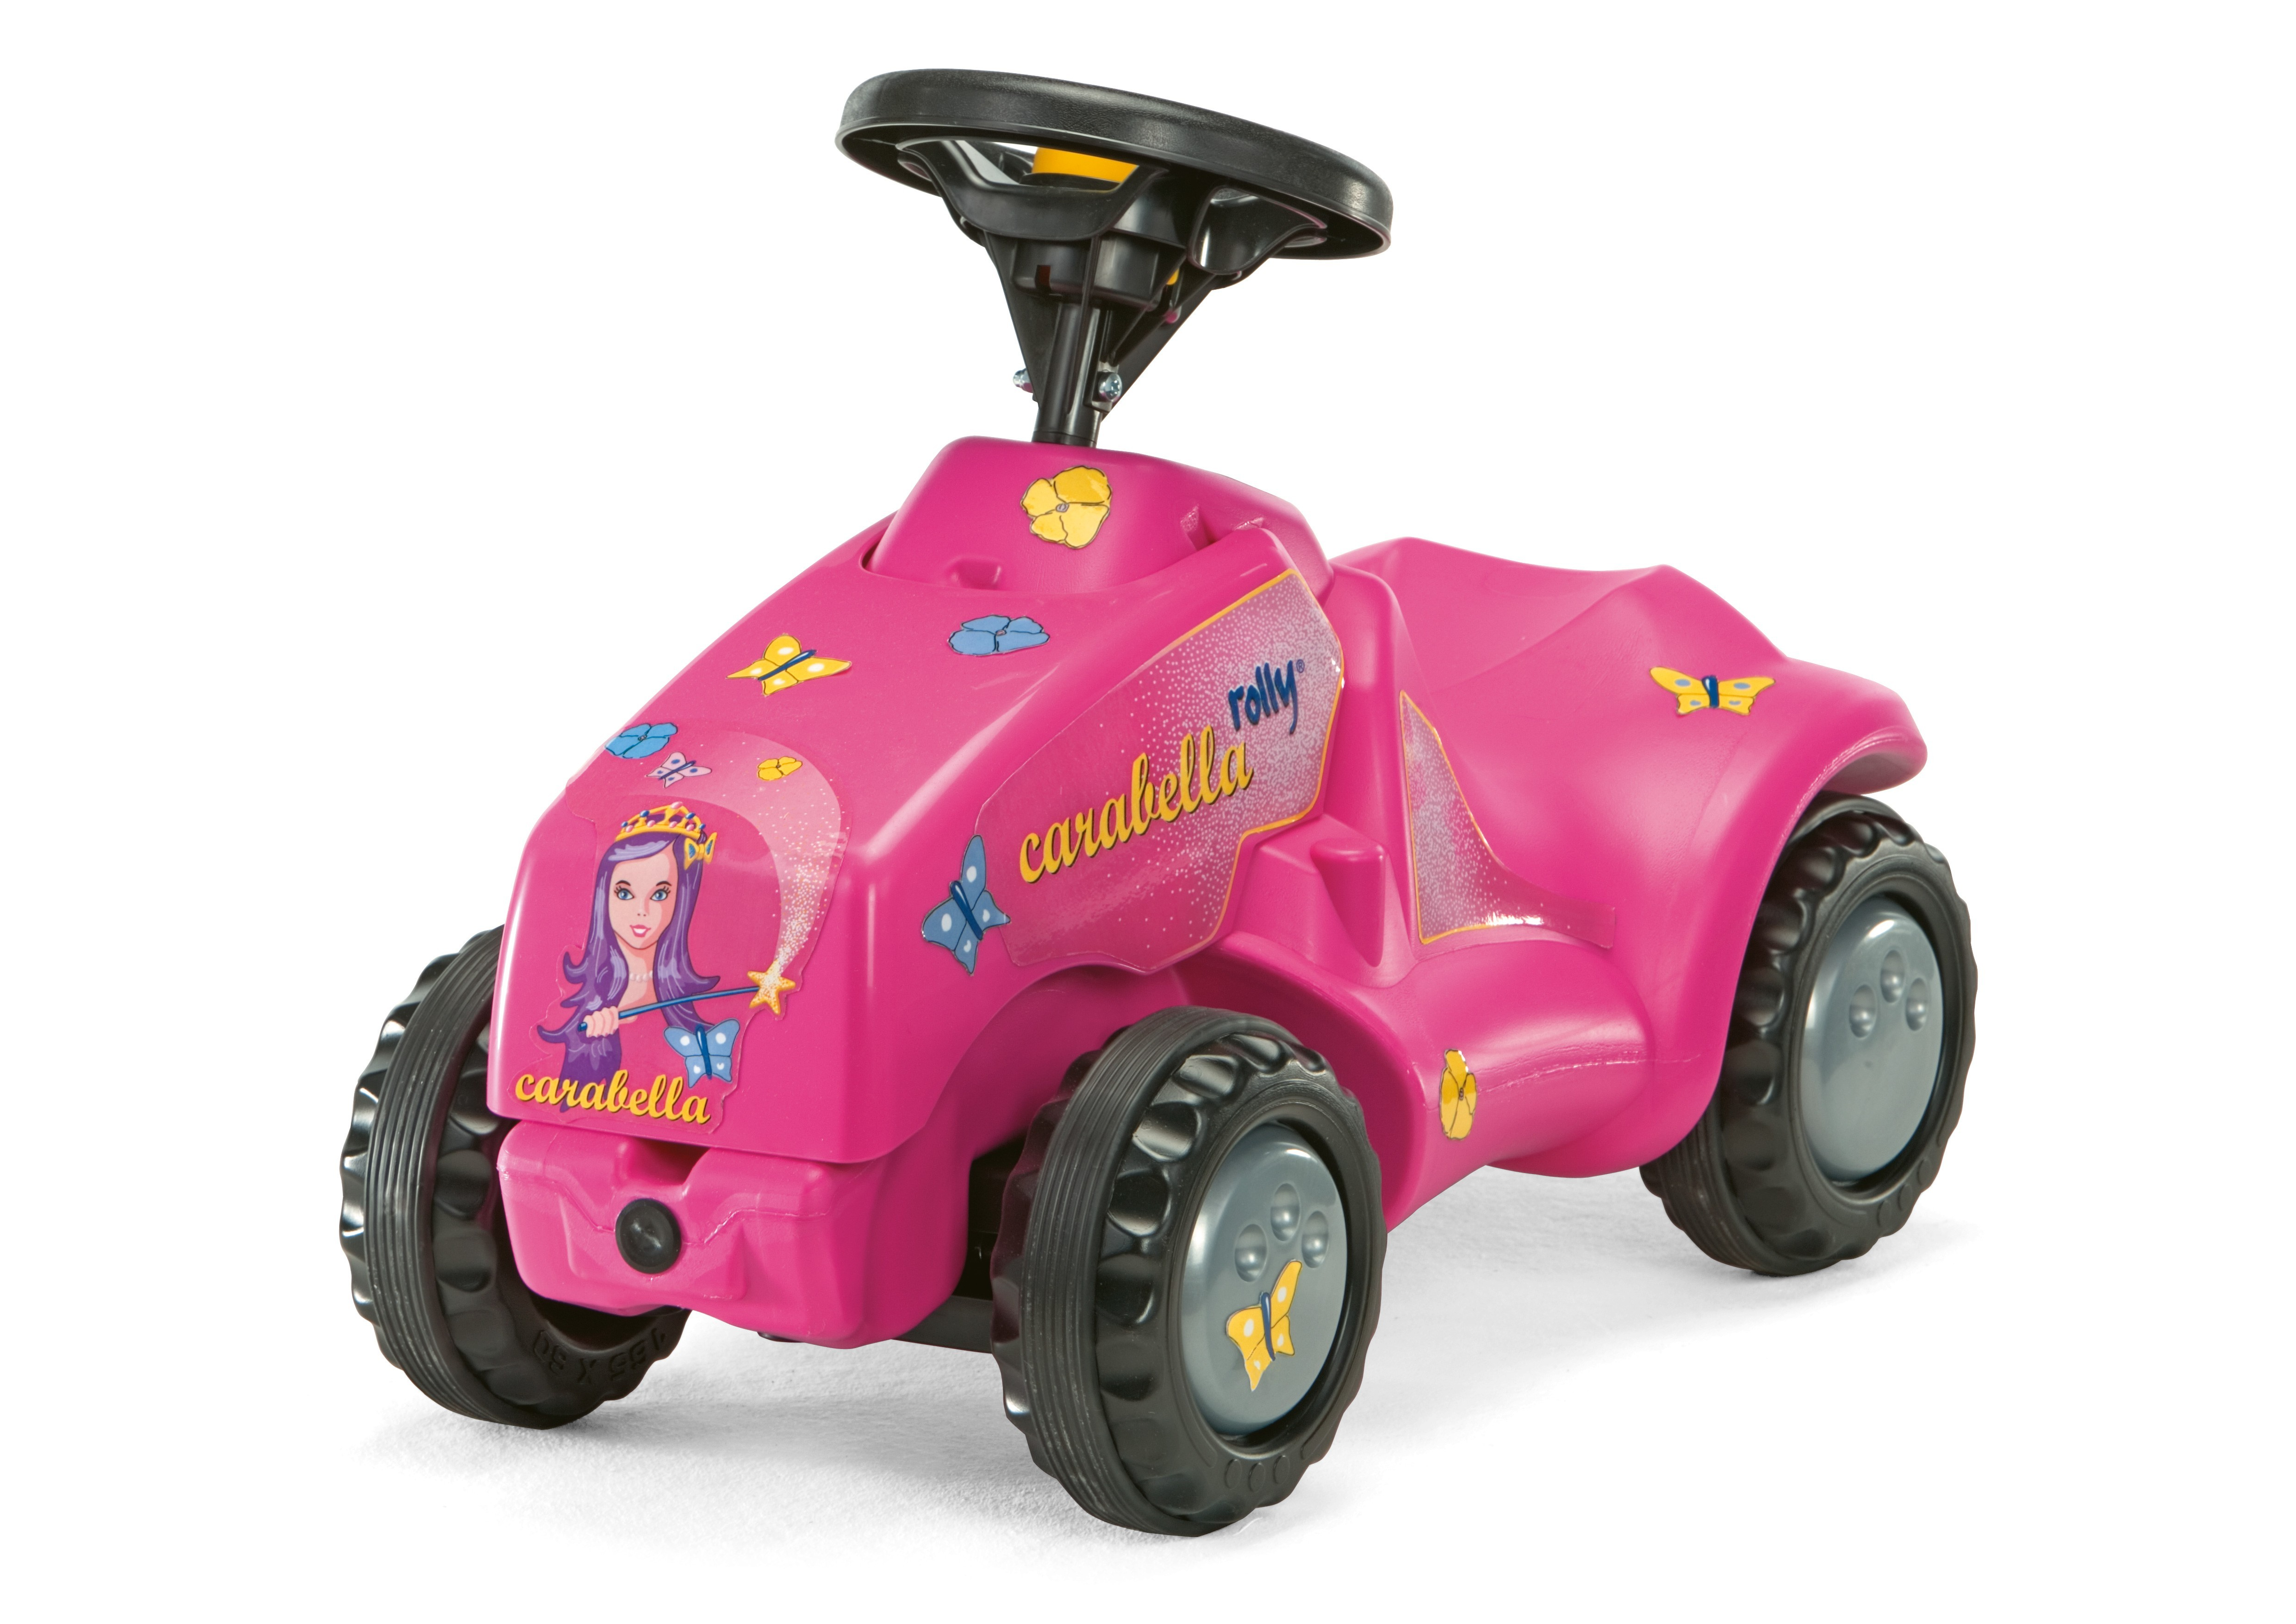 Rutscher rolly Minitrac Carabella - Rolly Toys Bild 1